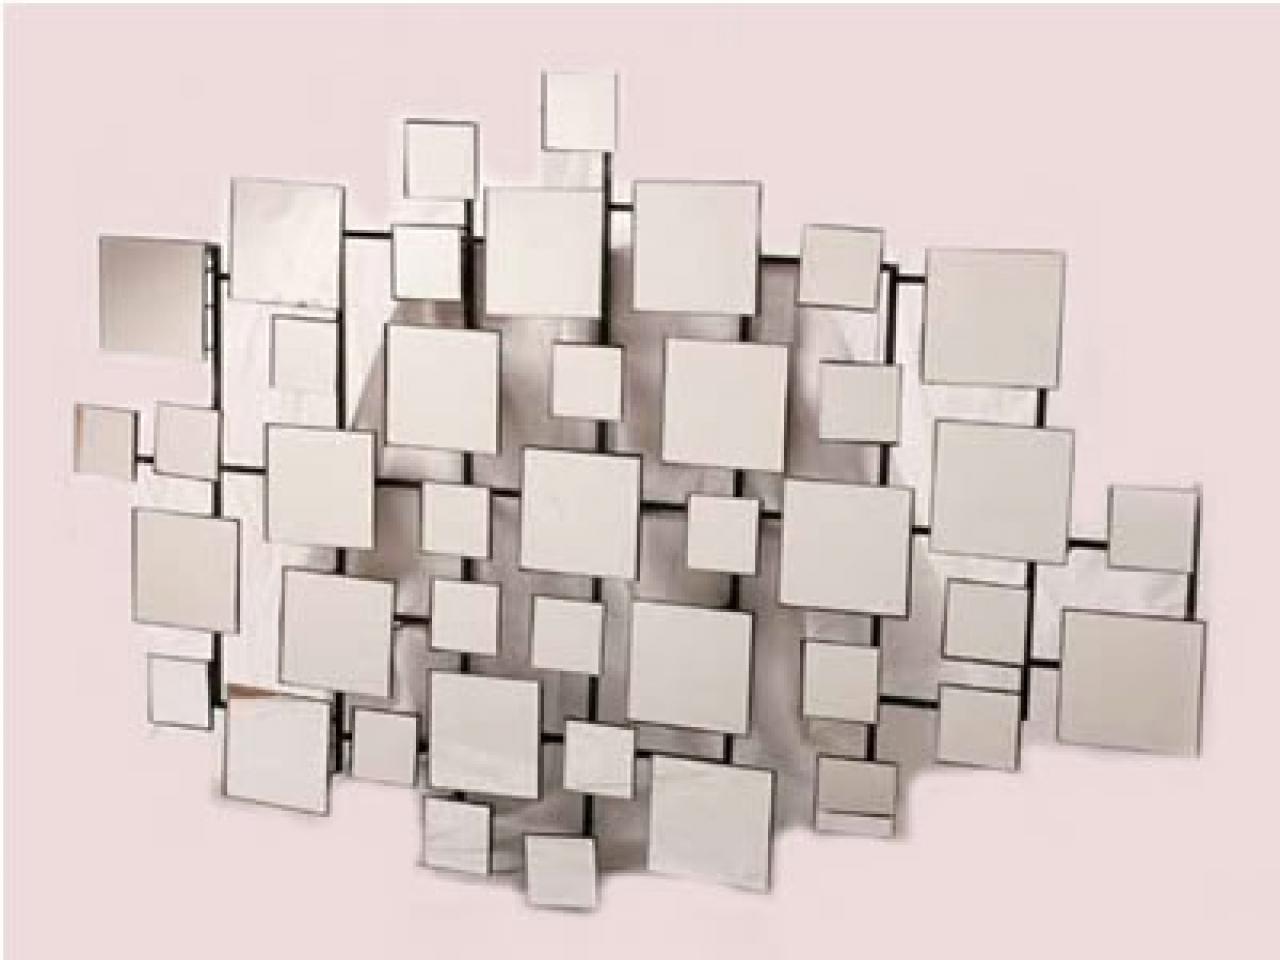 Modern Mirrored Wall Art, Geometric Mirror Wall Art, Mirror Wall Art Regarding Mirrored Wall Art (View 19 of 20)